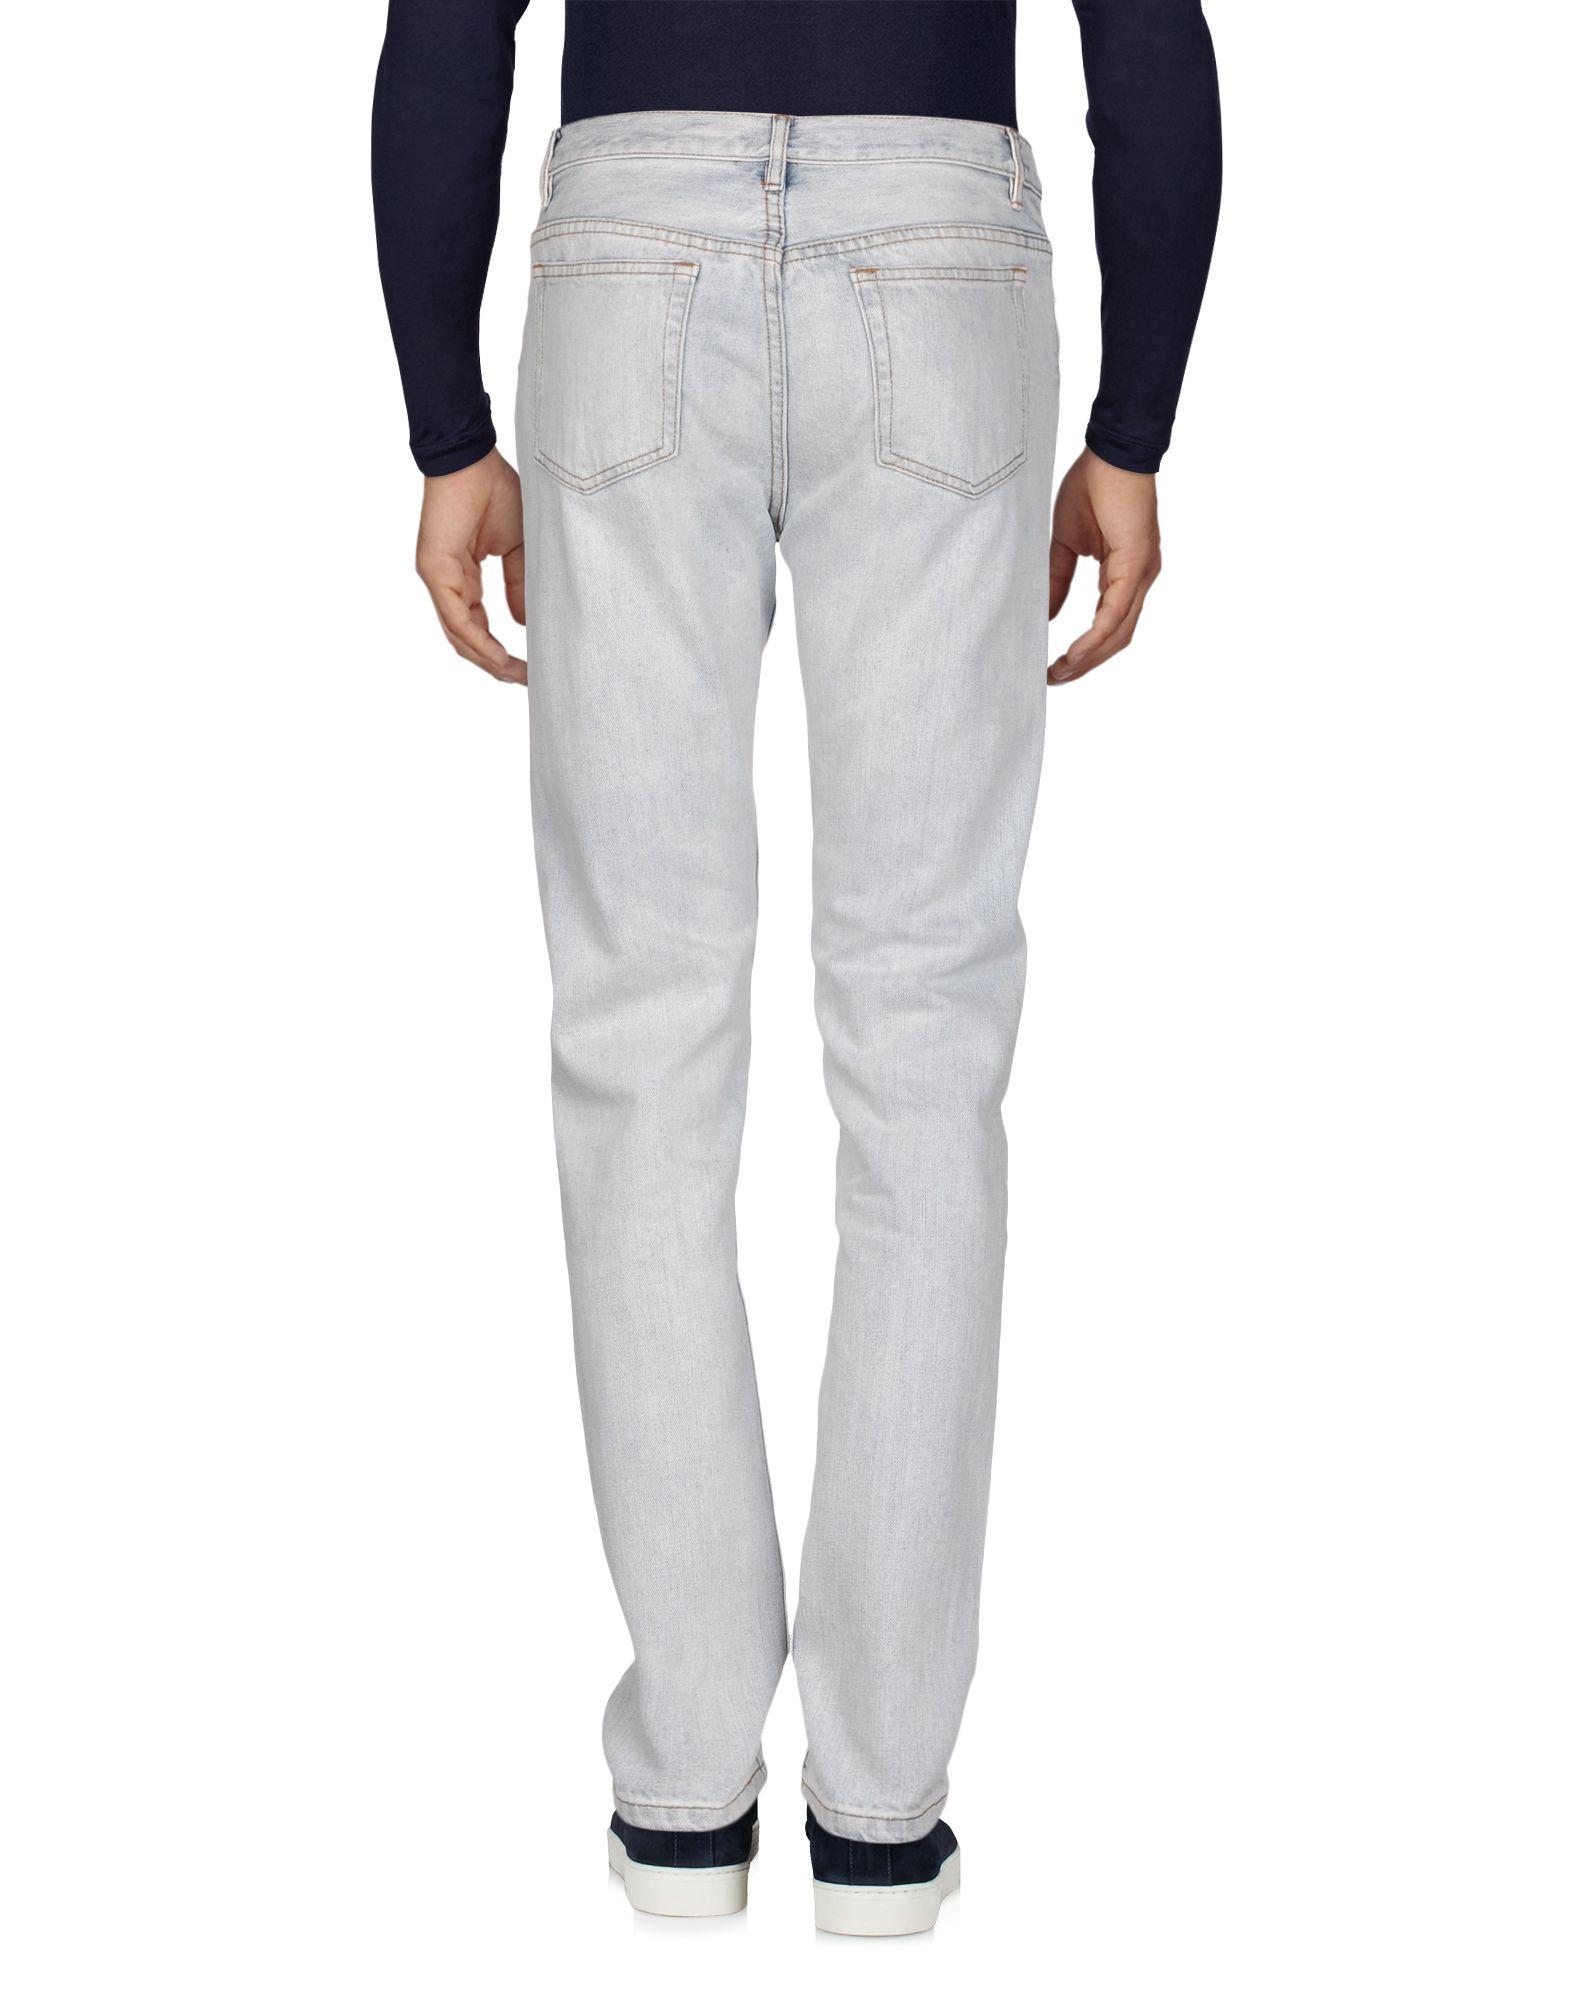 Pantaloni Jeans 42682282OL A.P.C. Uomo - 42682282OL Jeans a6e475